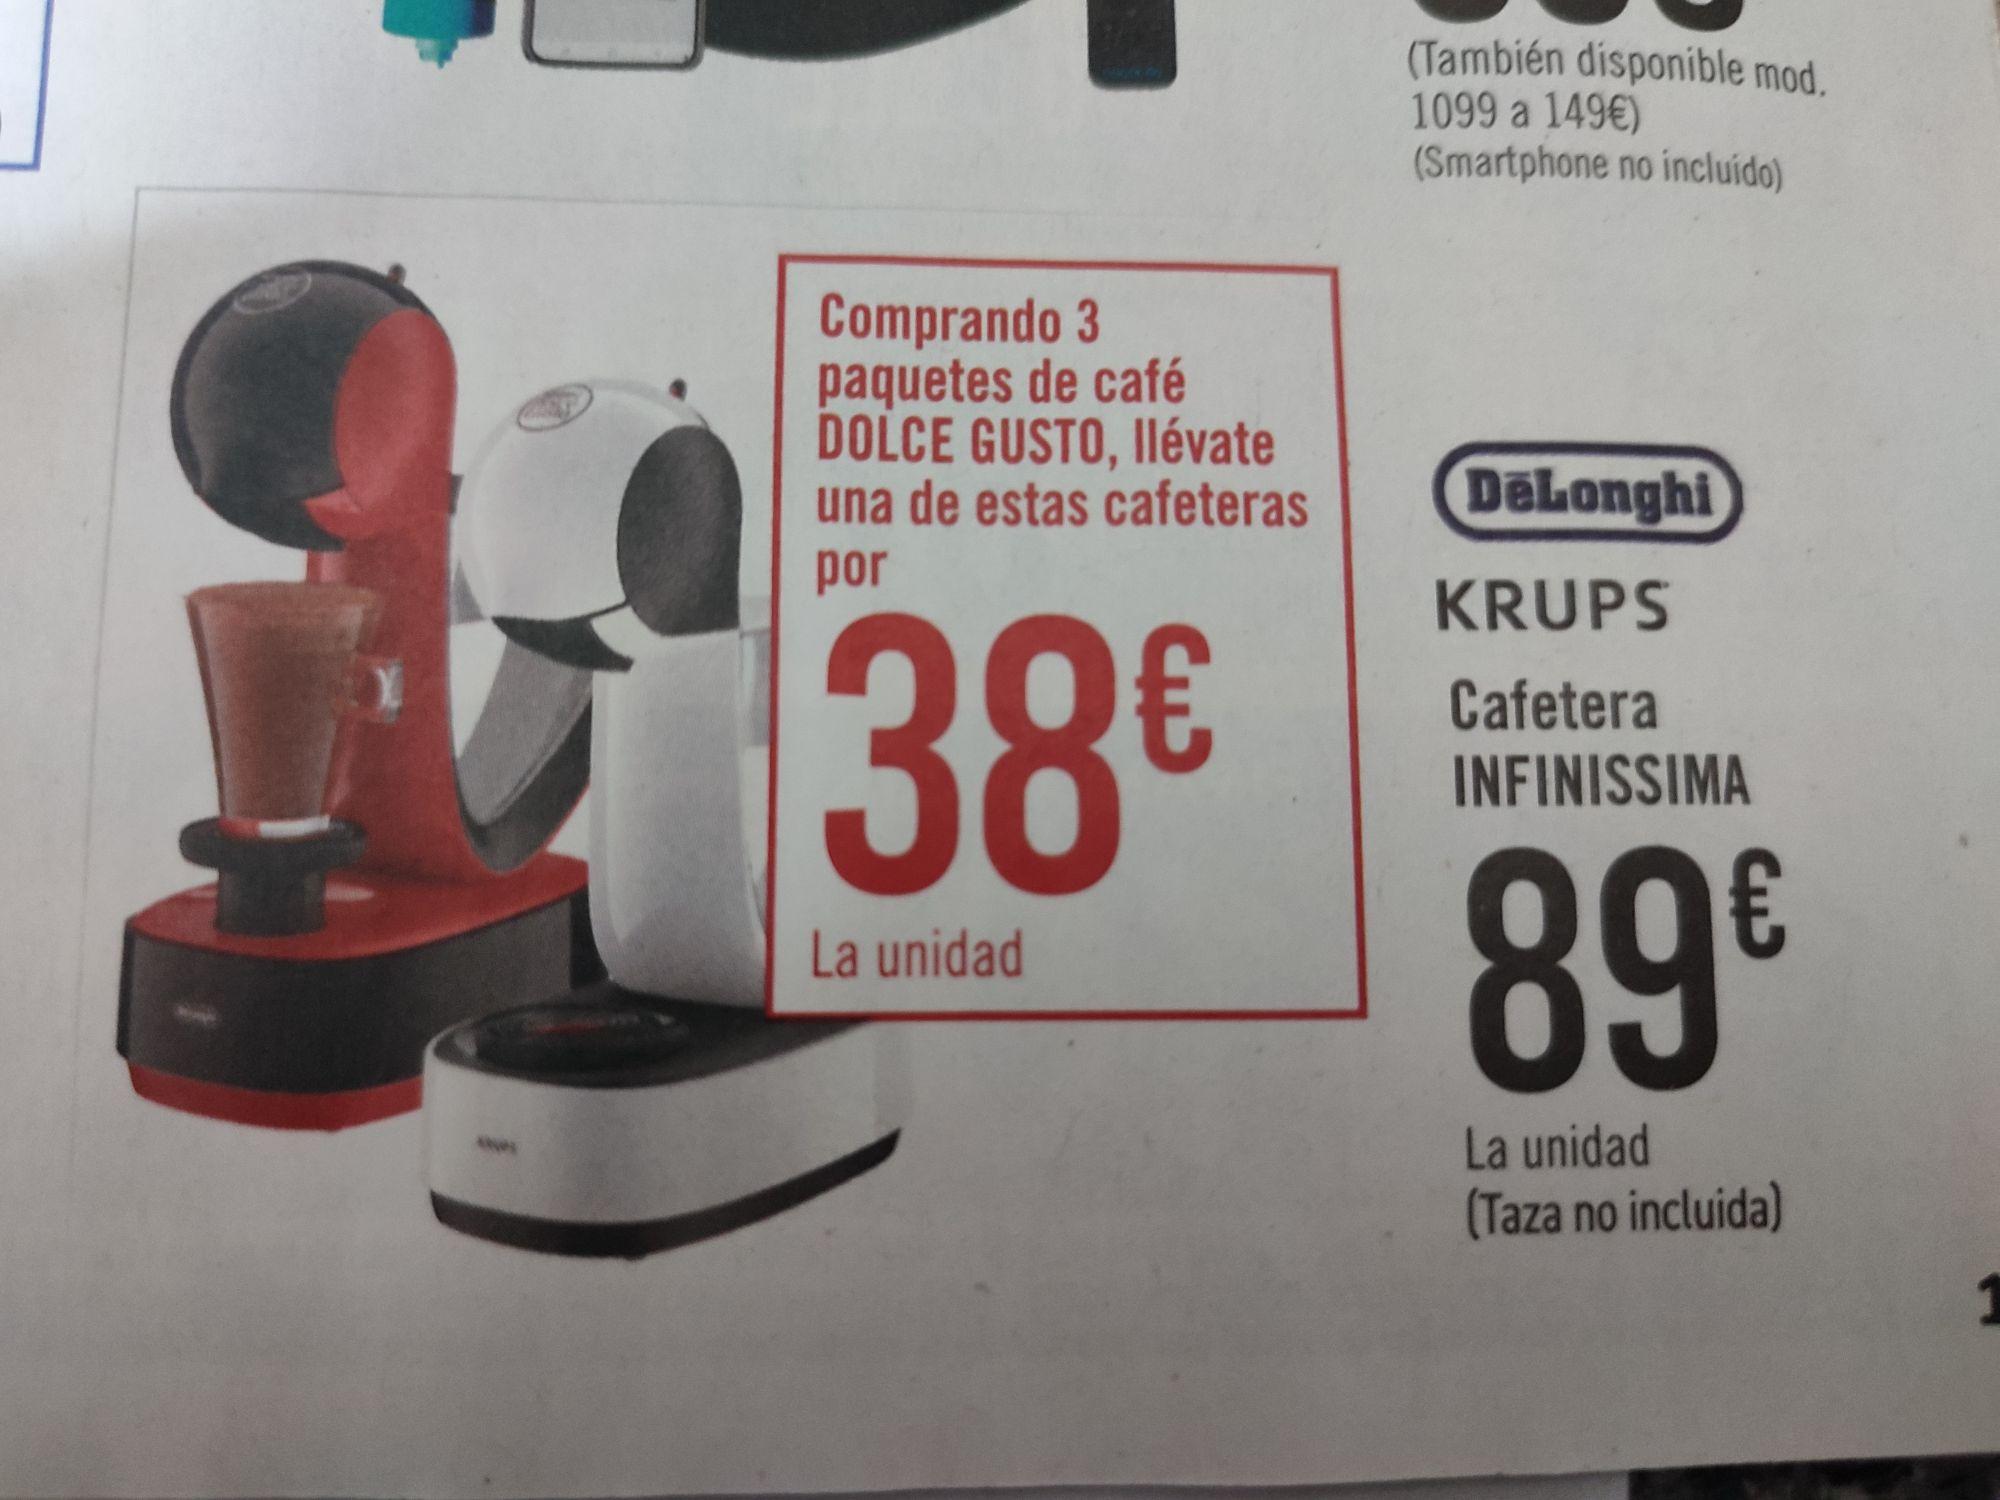 Cafetera dolce gusto Krups infinissima delonghi en Carrefour